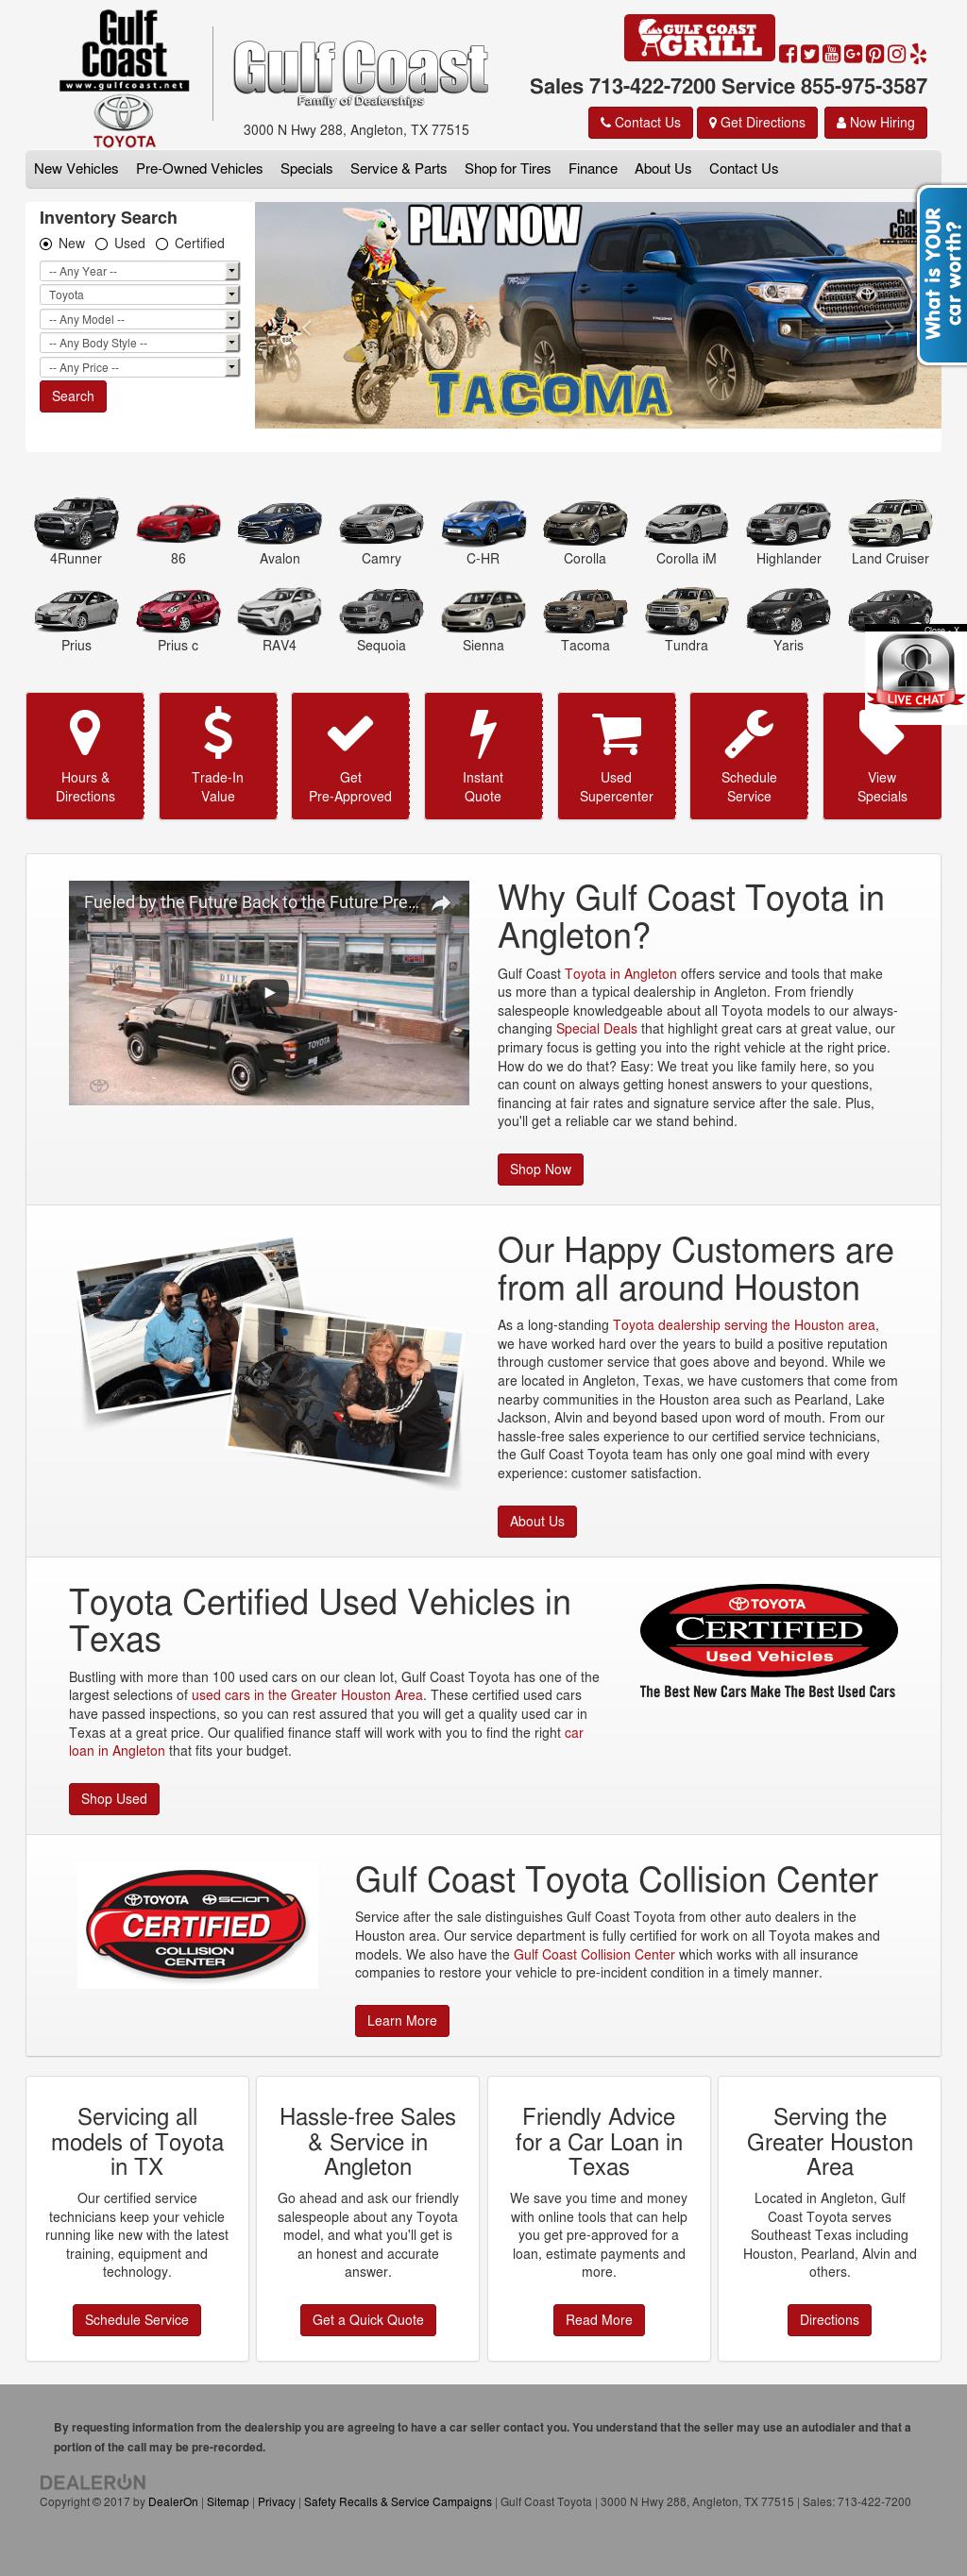 Gulf Coast Toyota >> Gulf Coast Toyota Competitors Revenue And Employees Owler